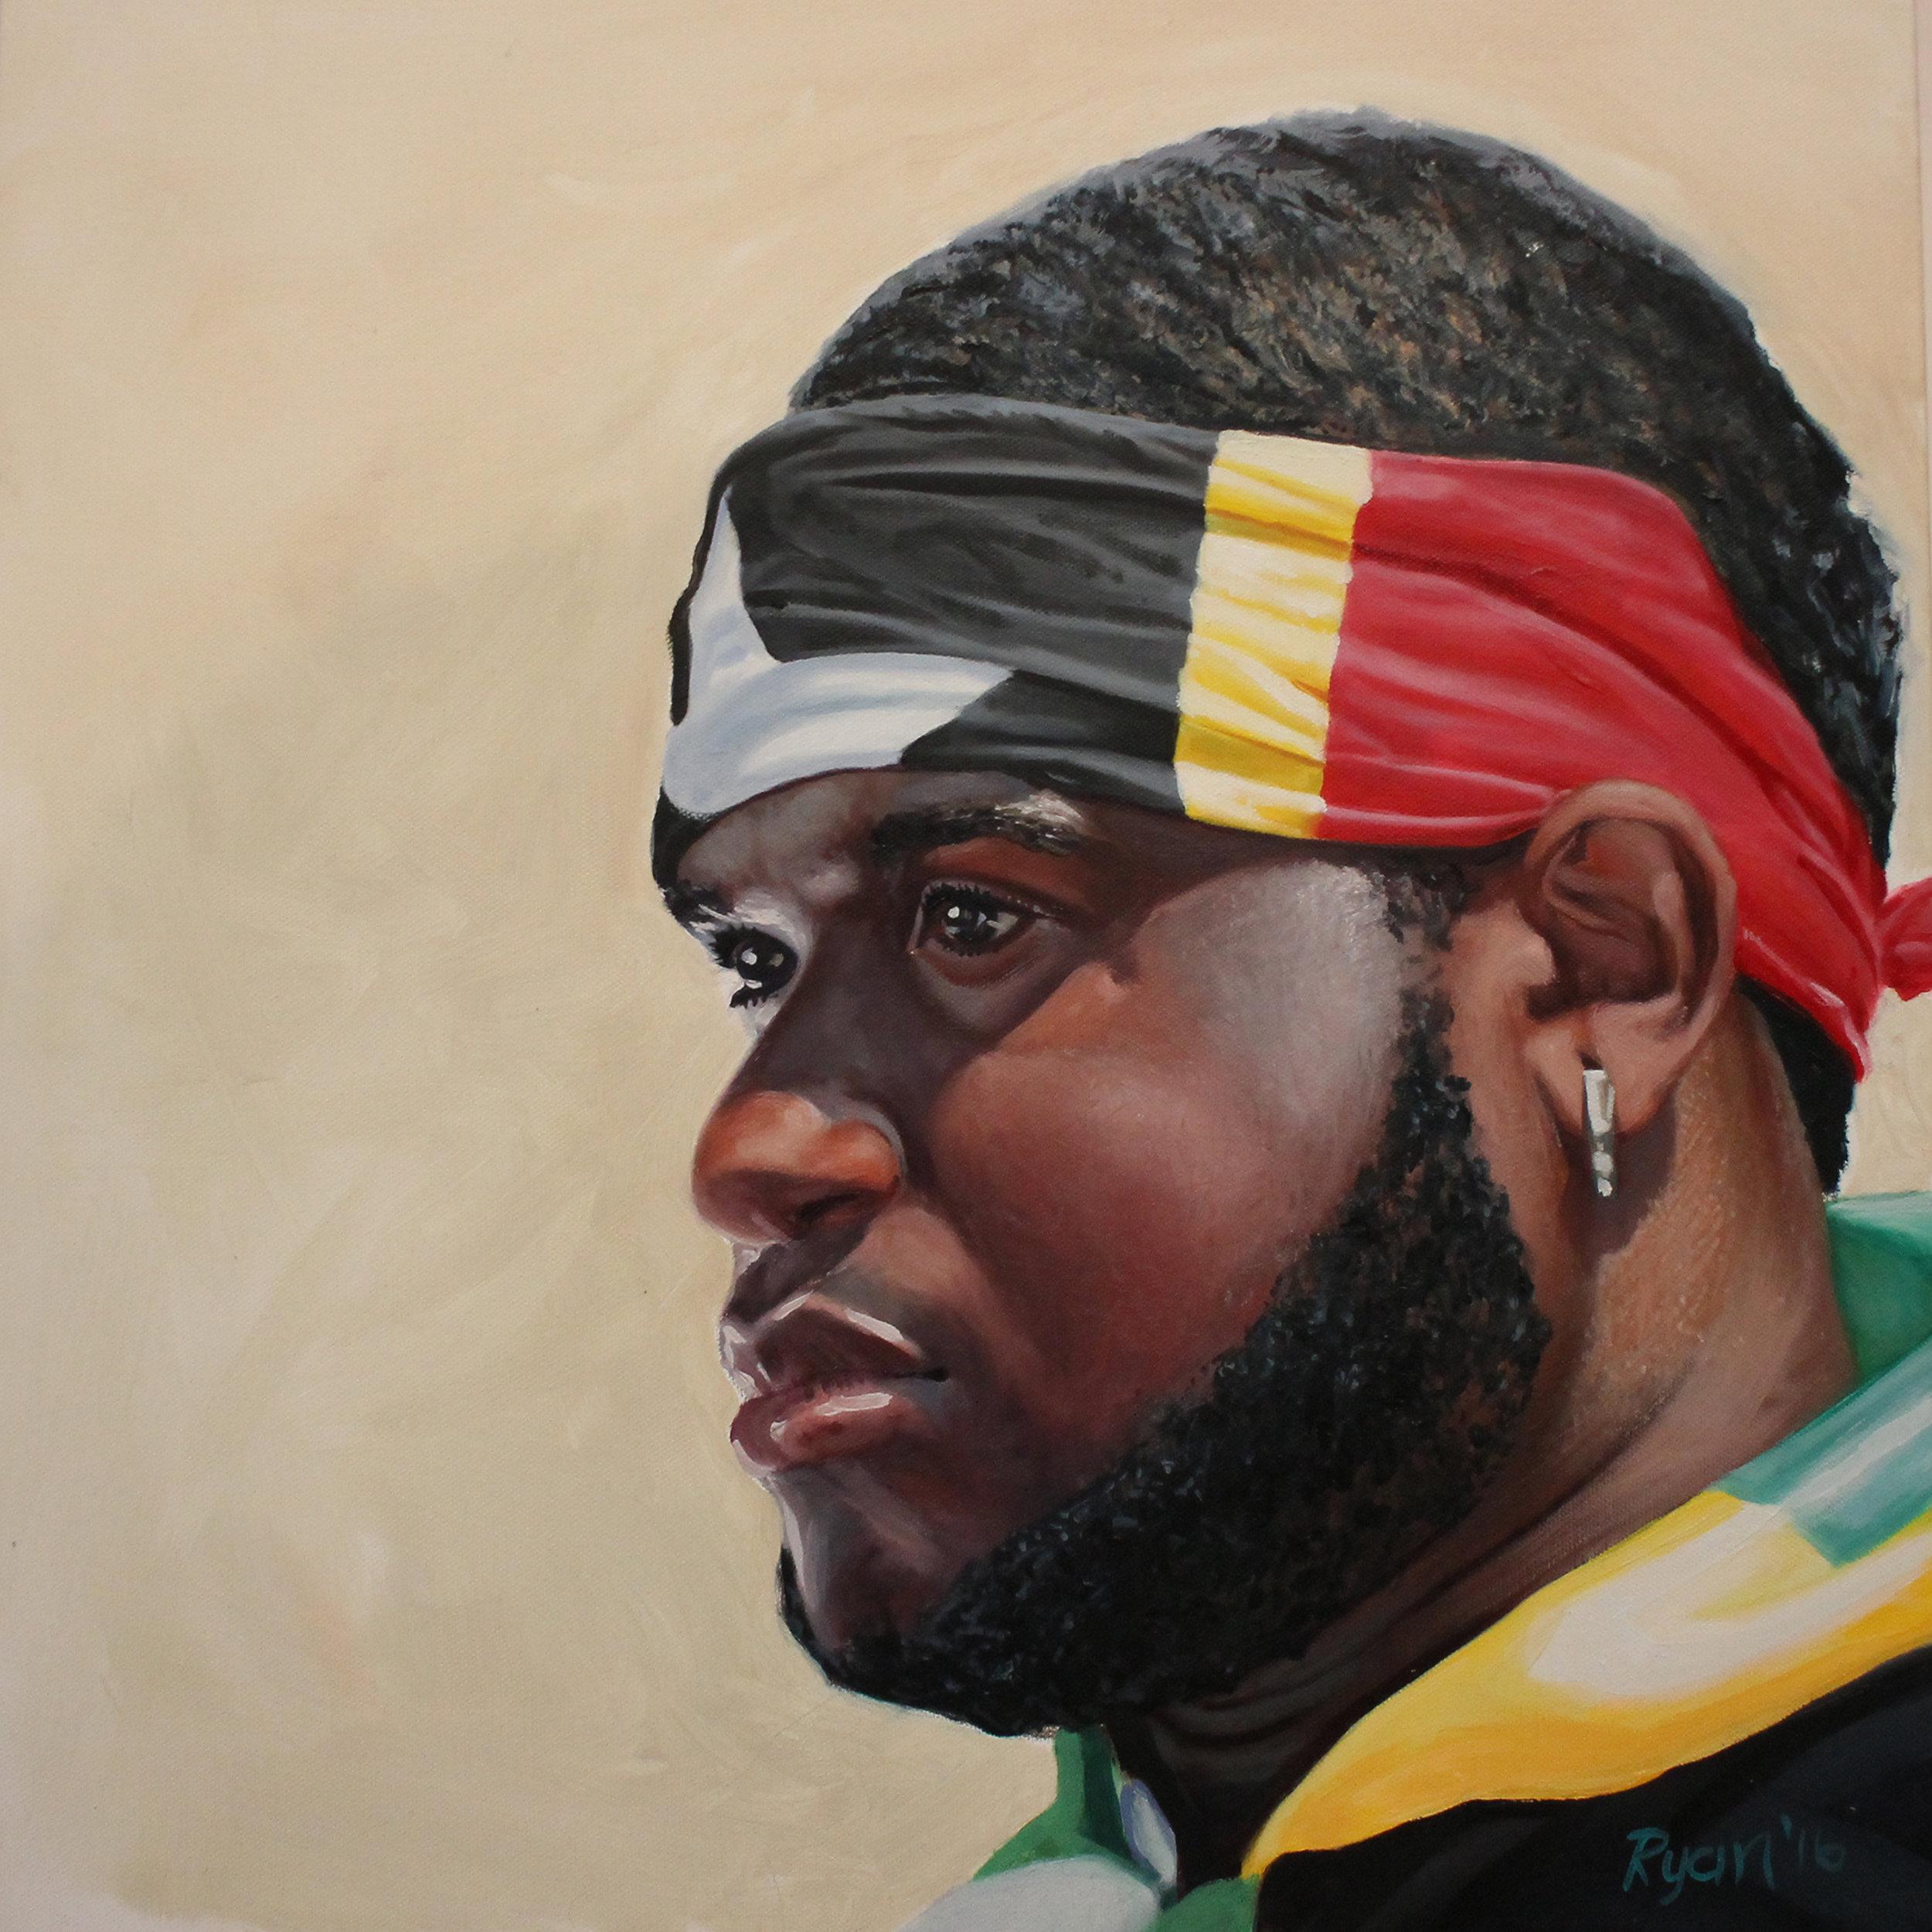 Man from Nevis-2.jpg